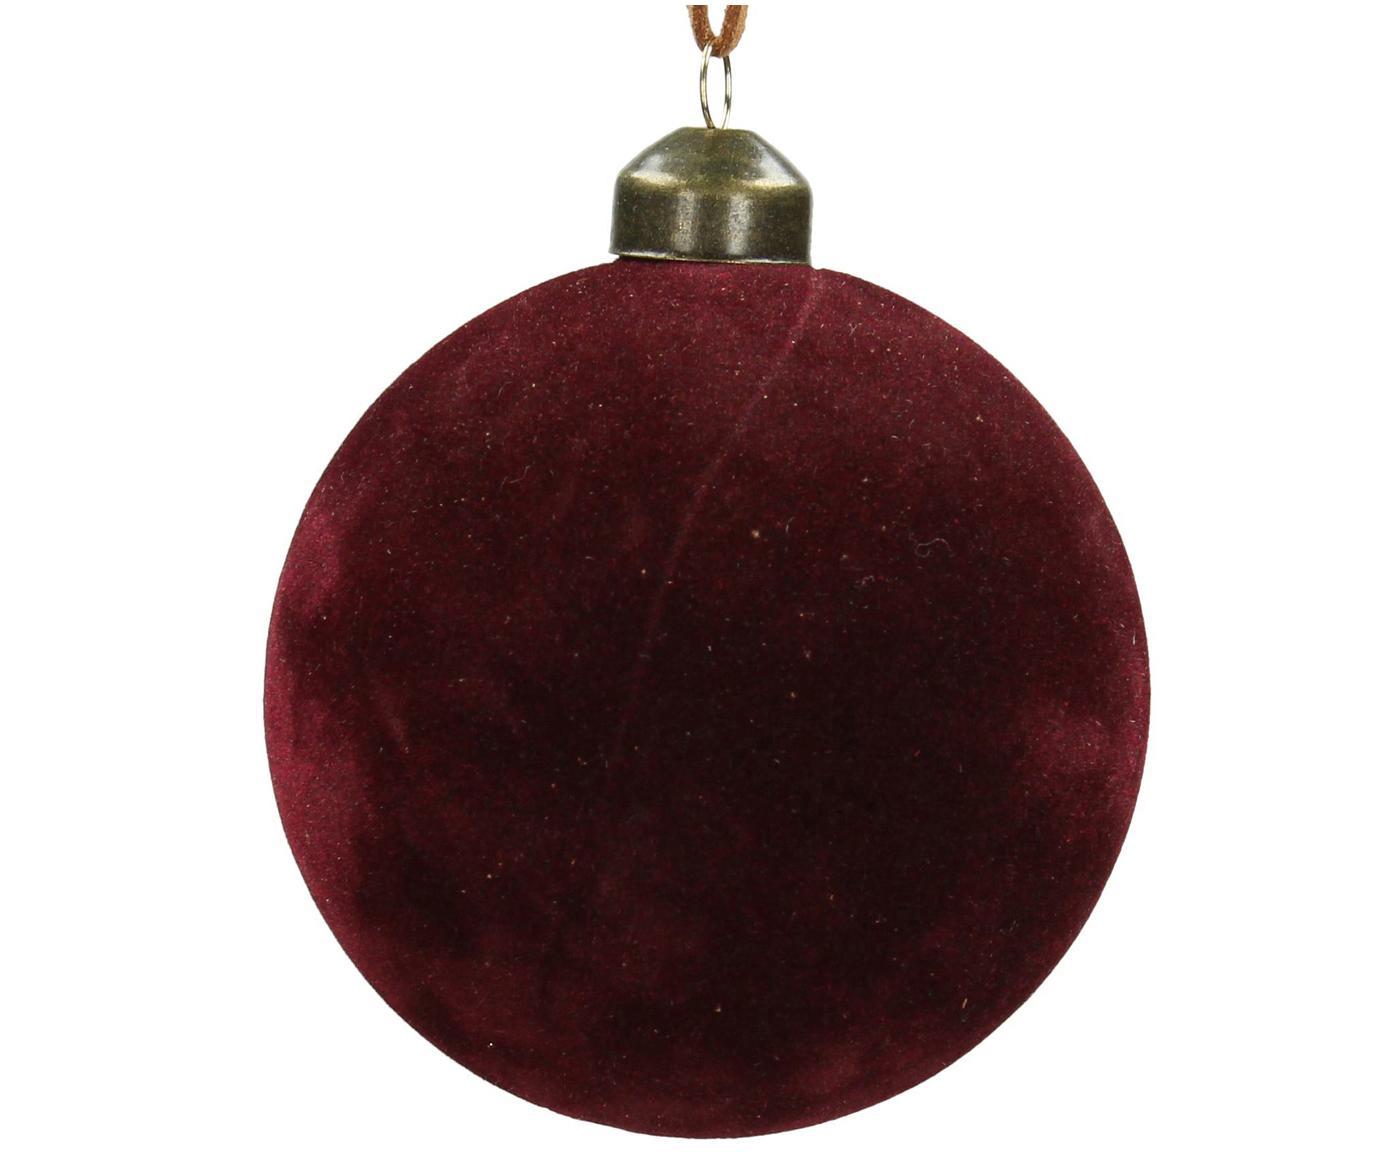 Weihnachtskugeln Velvet Ø8cm, 4Stück, Glas, Polyestersamt, Dunkelrot, Ø 8 cm